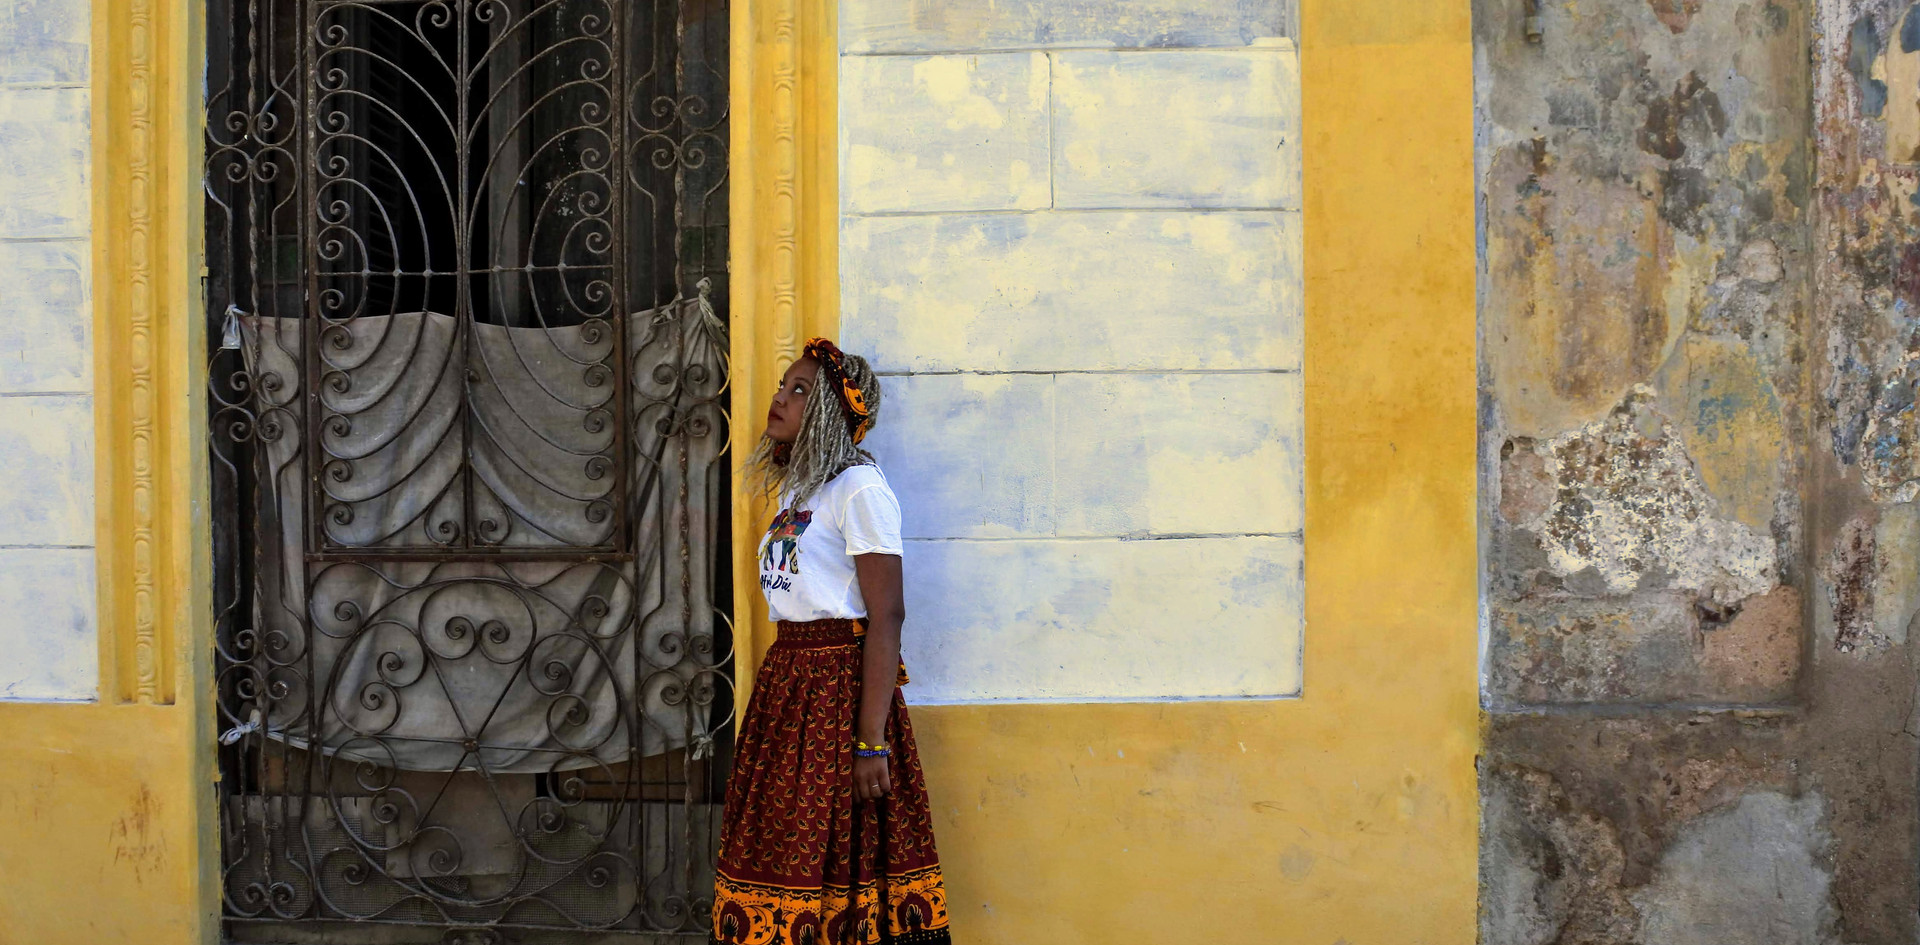 Larys SMith Cuba